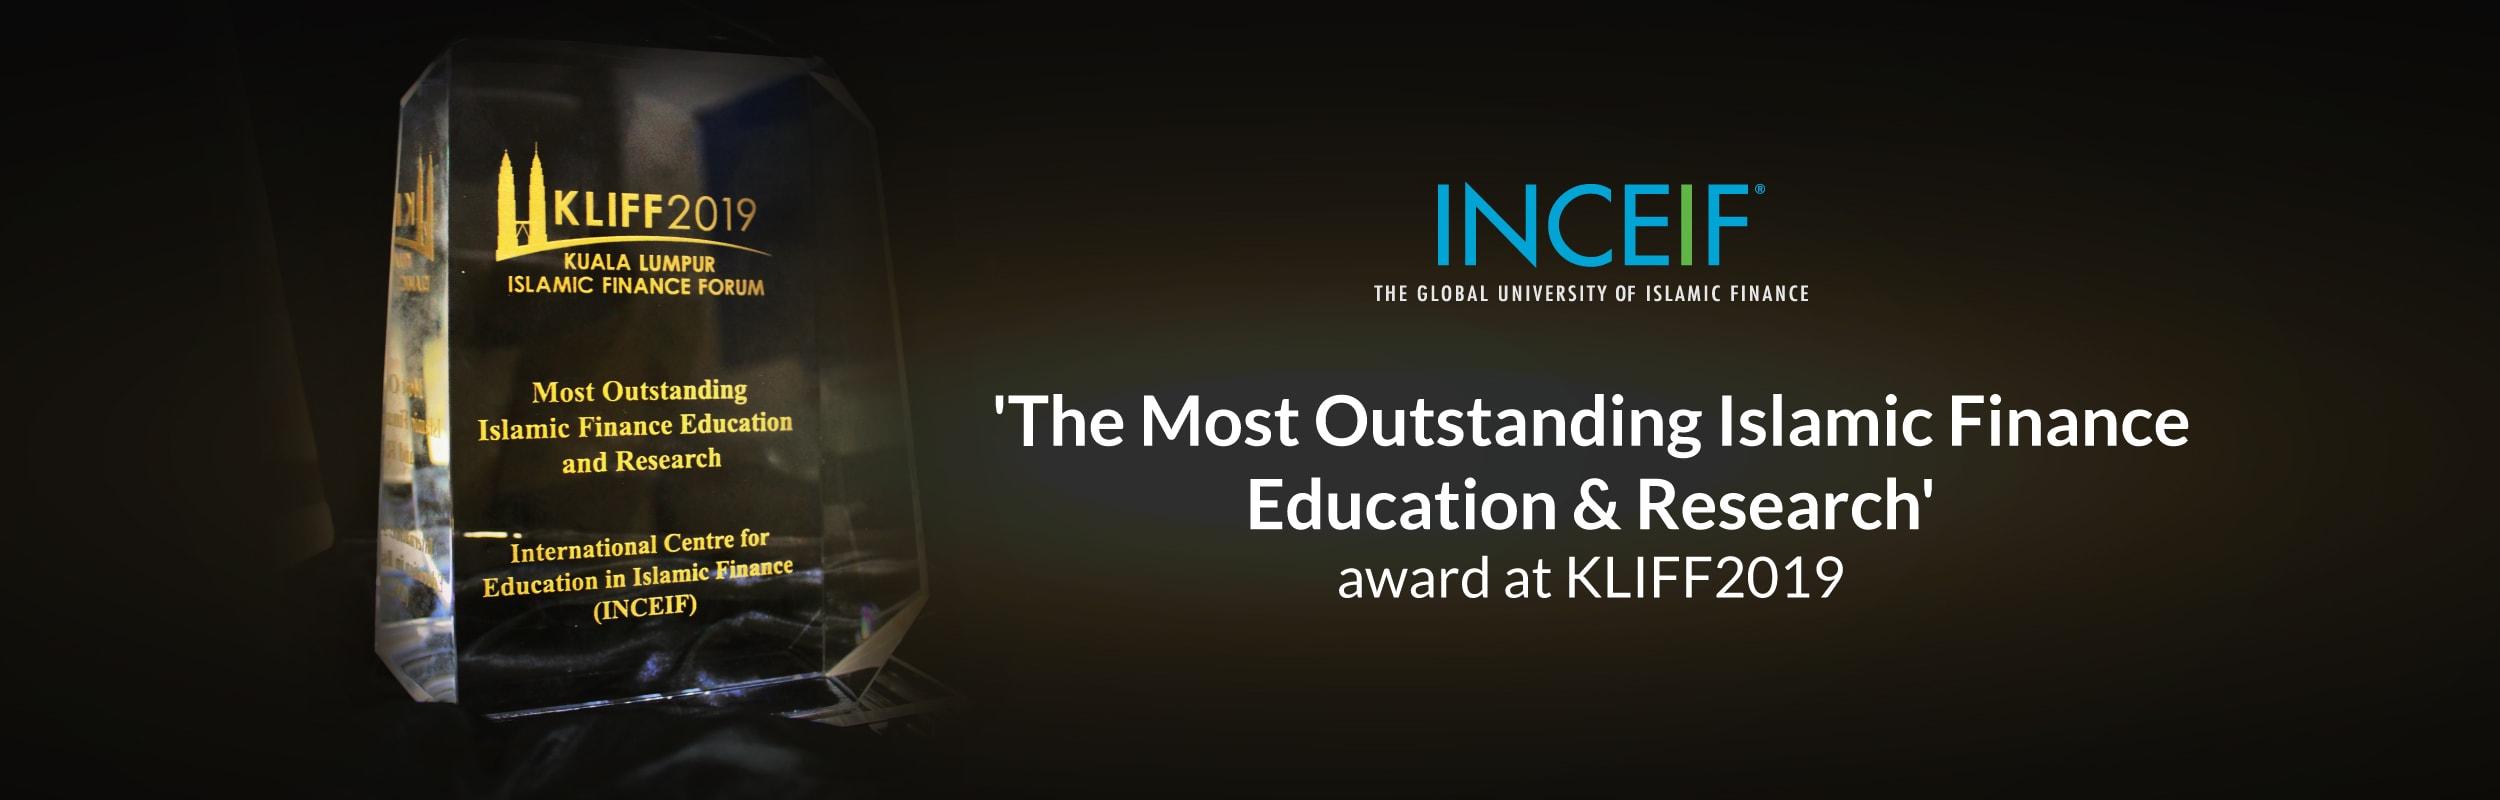 INCEIF   The Global University of Islamic Finance